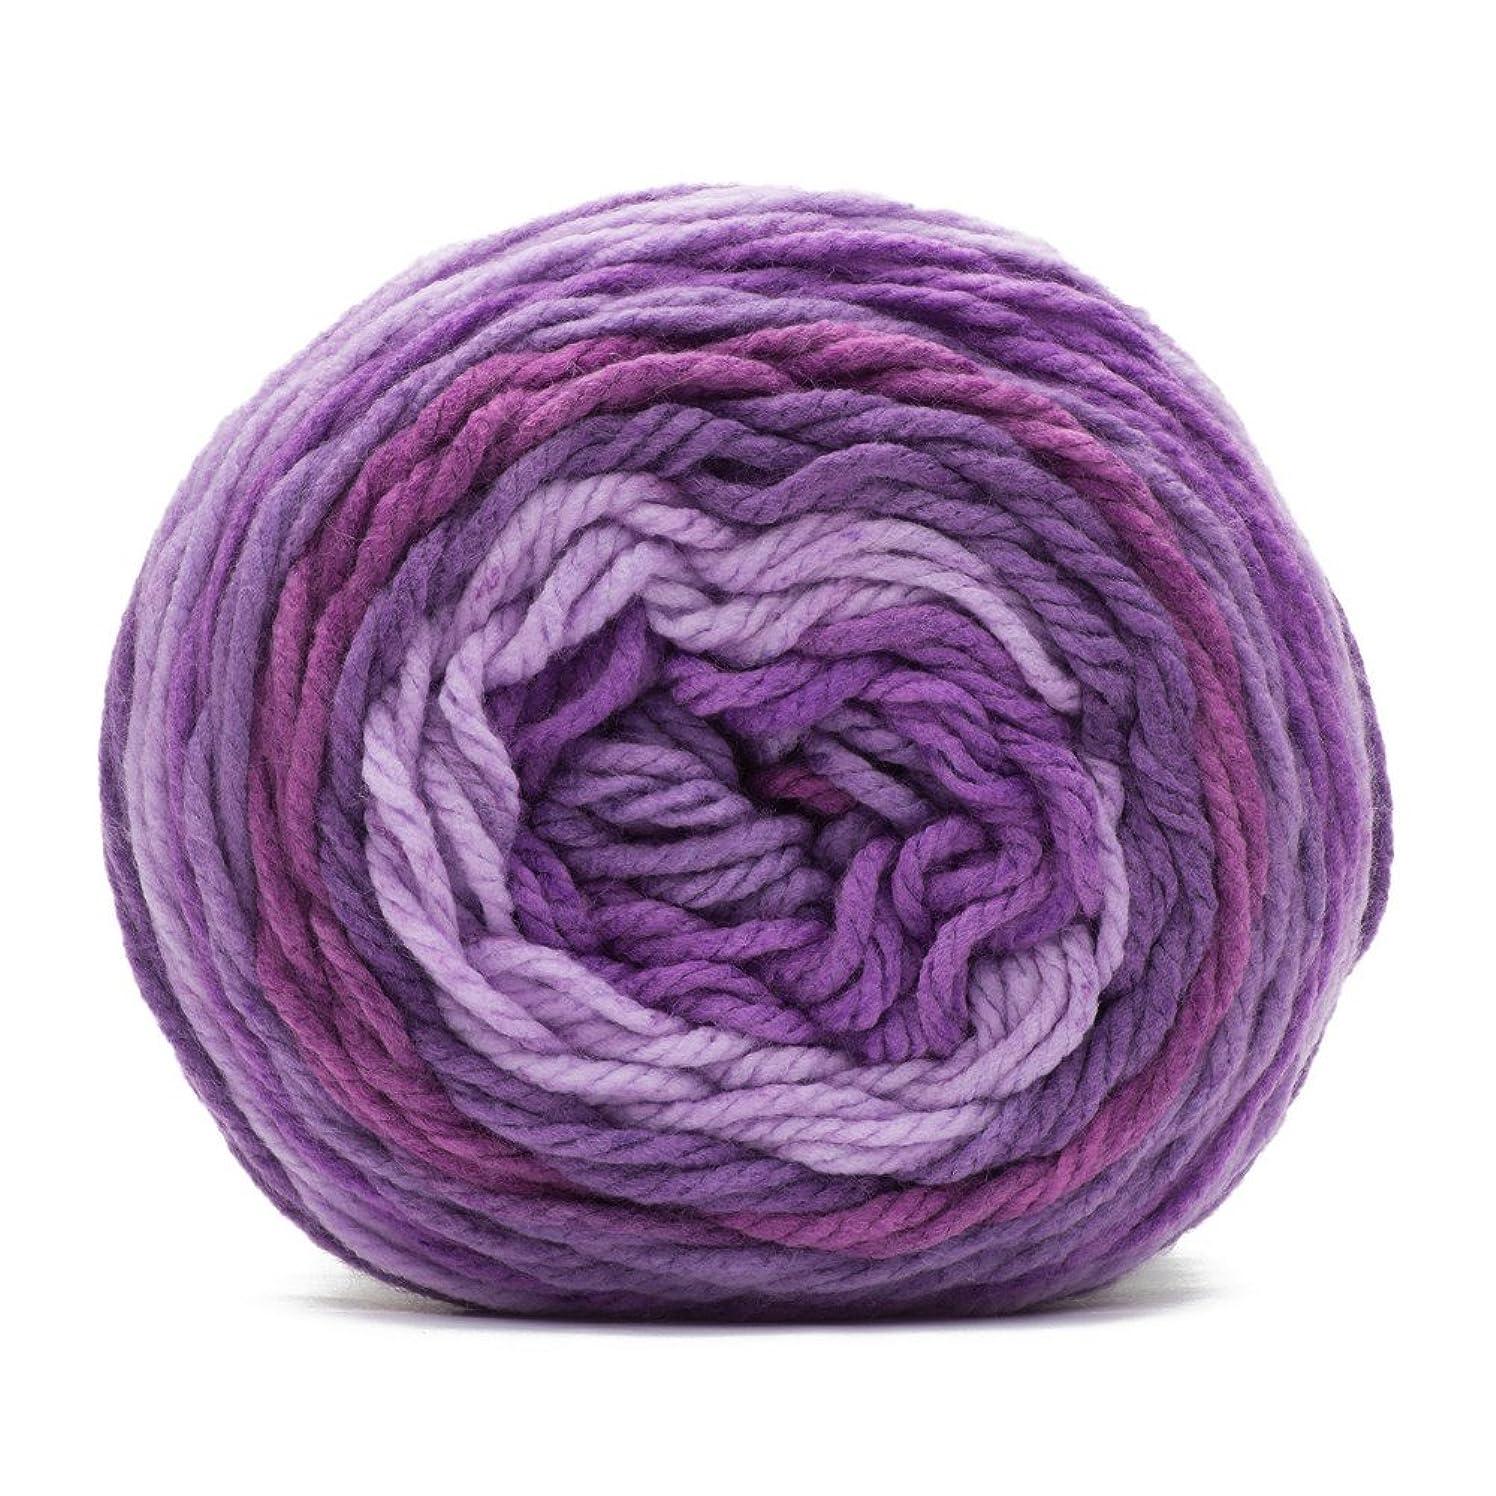 Caron Chunky Cakes Yarn - Elderberry Jelly